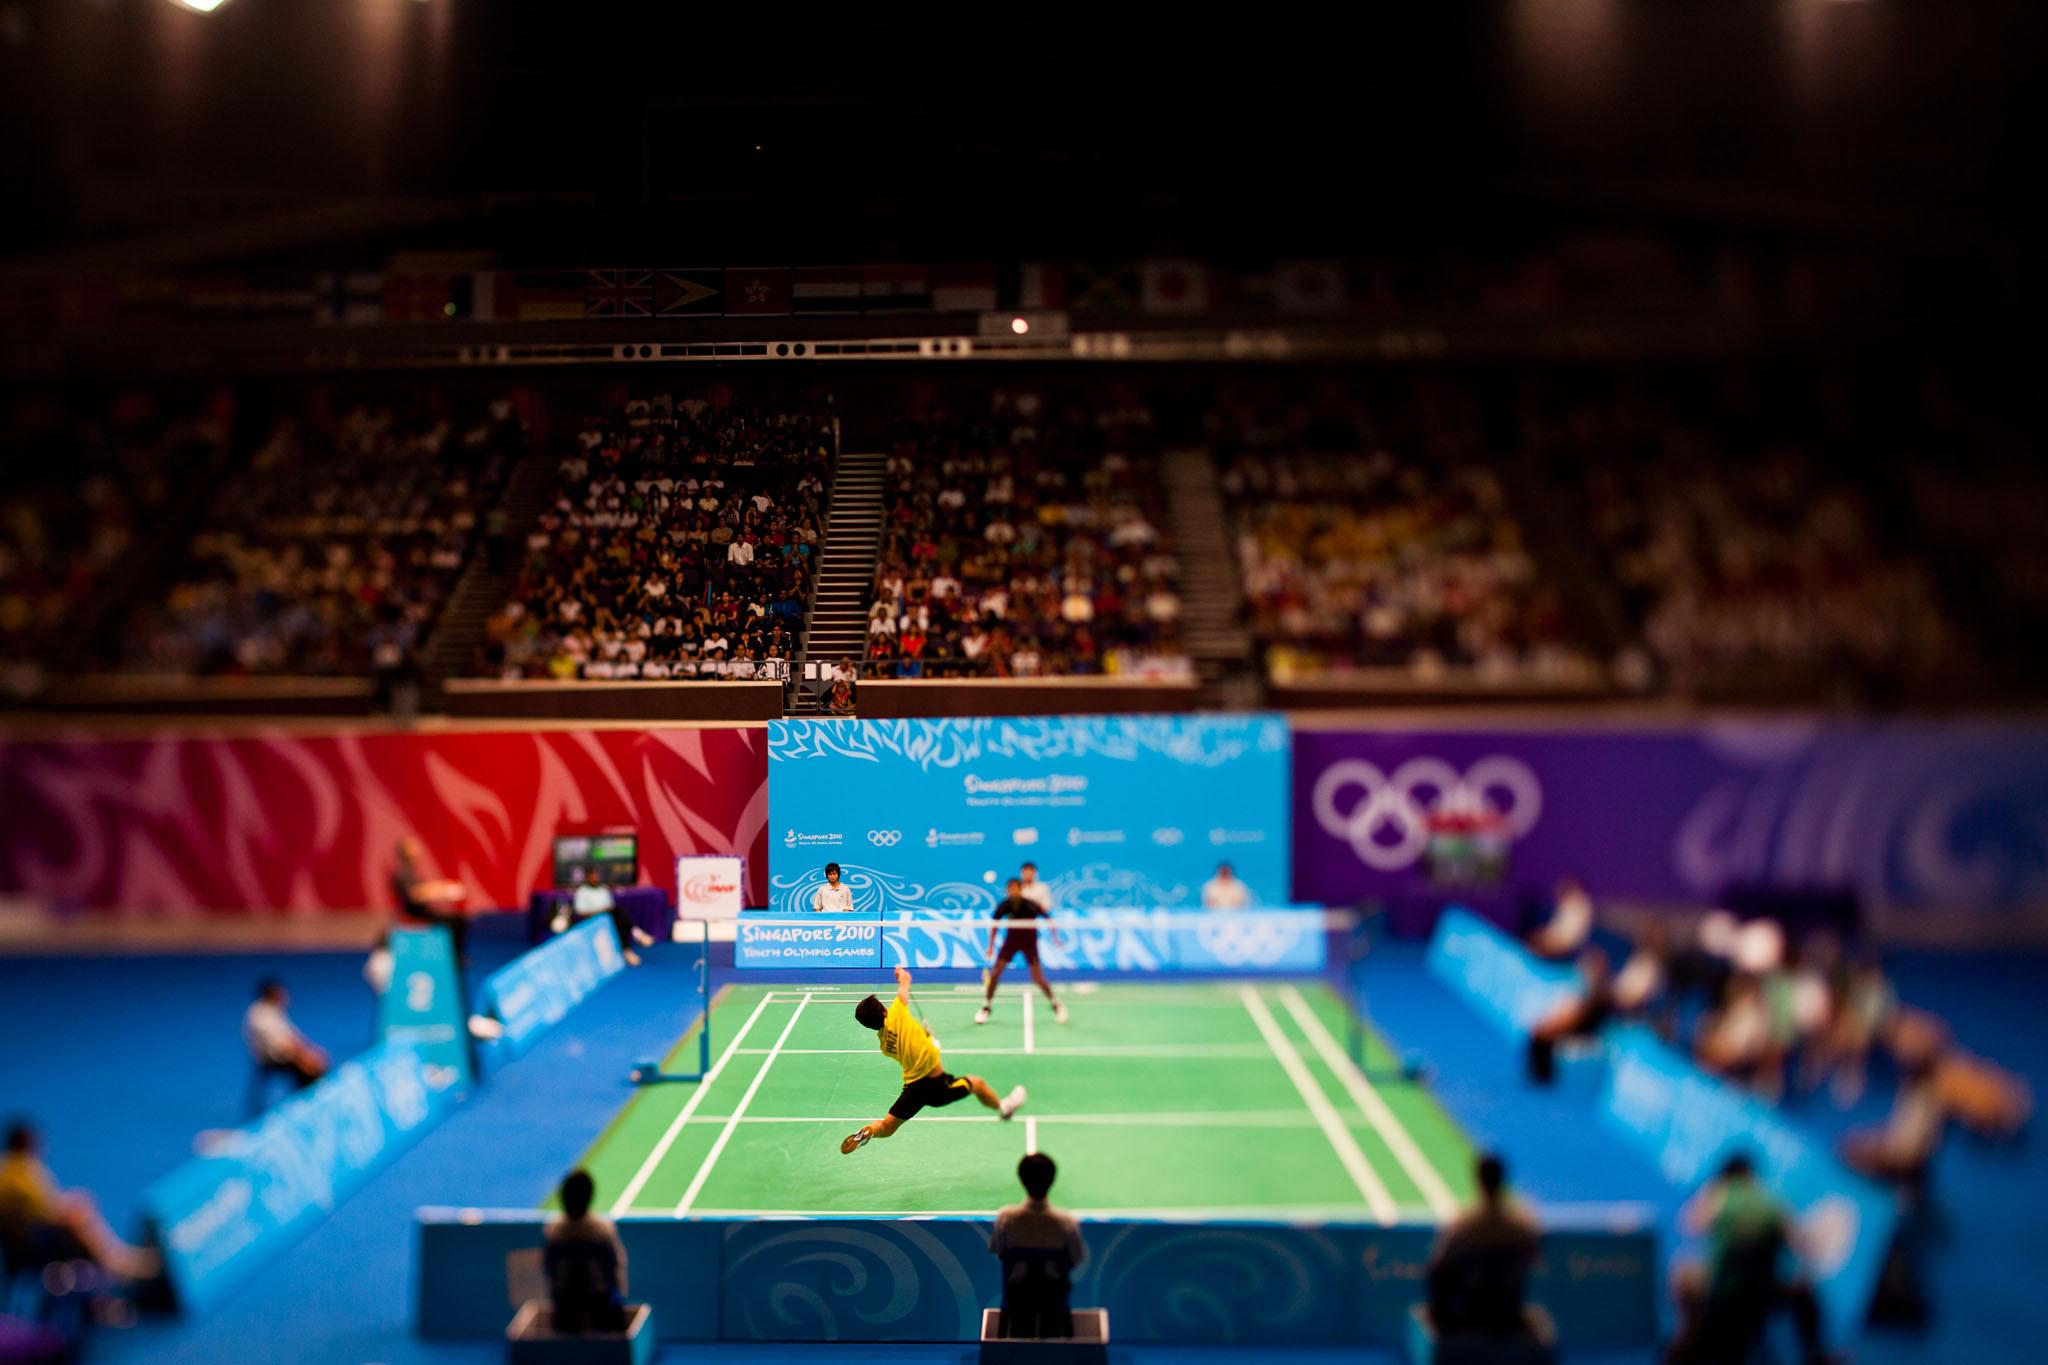 singapore-commercial-photographer-editorial-documentary-tiltshift-yog-olympic-games-olympics-zakaria-zainal-04.jpg